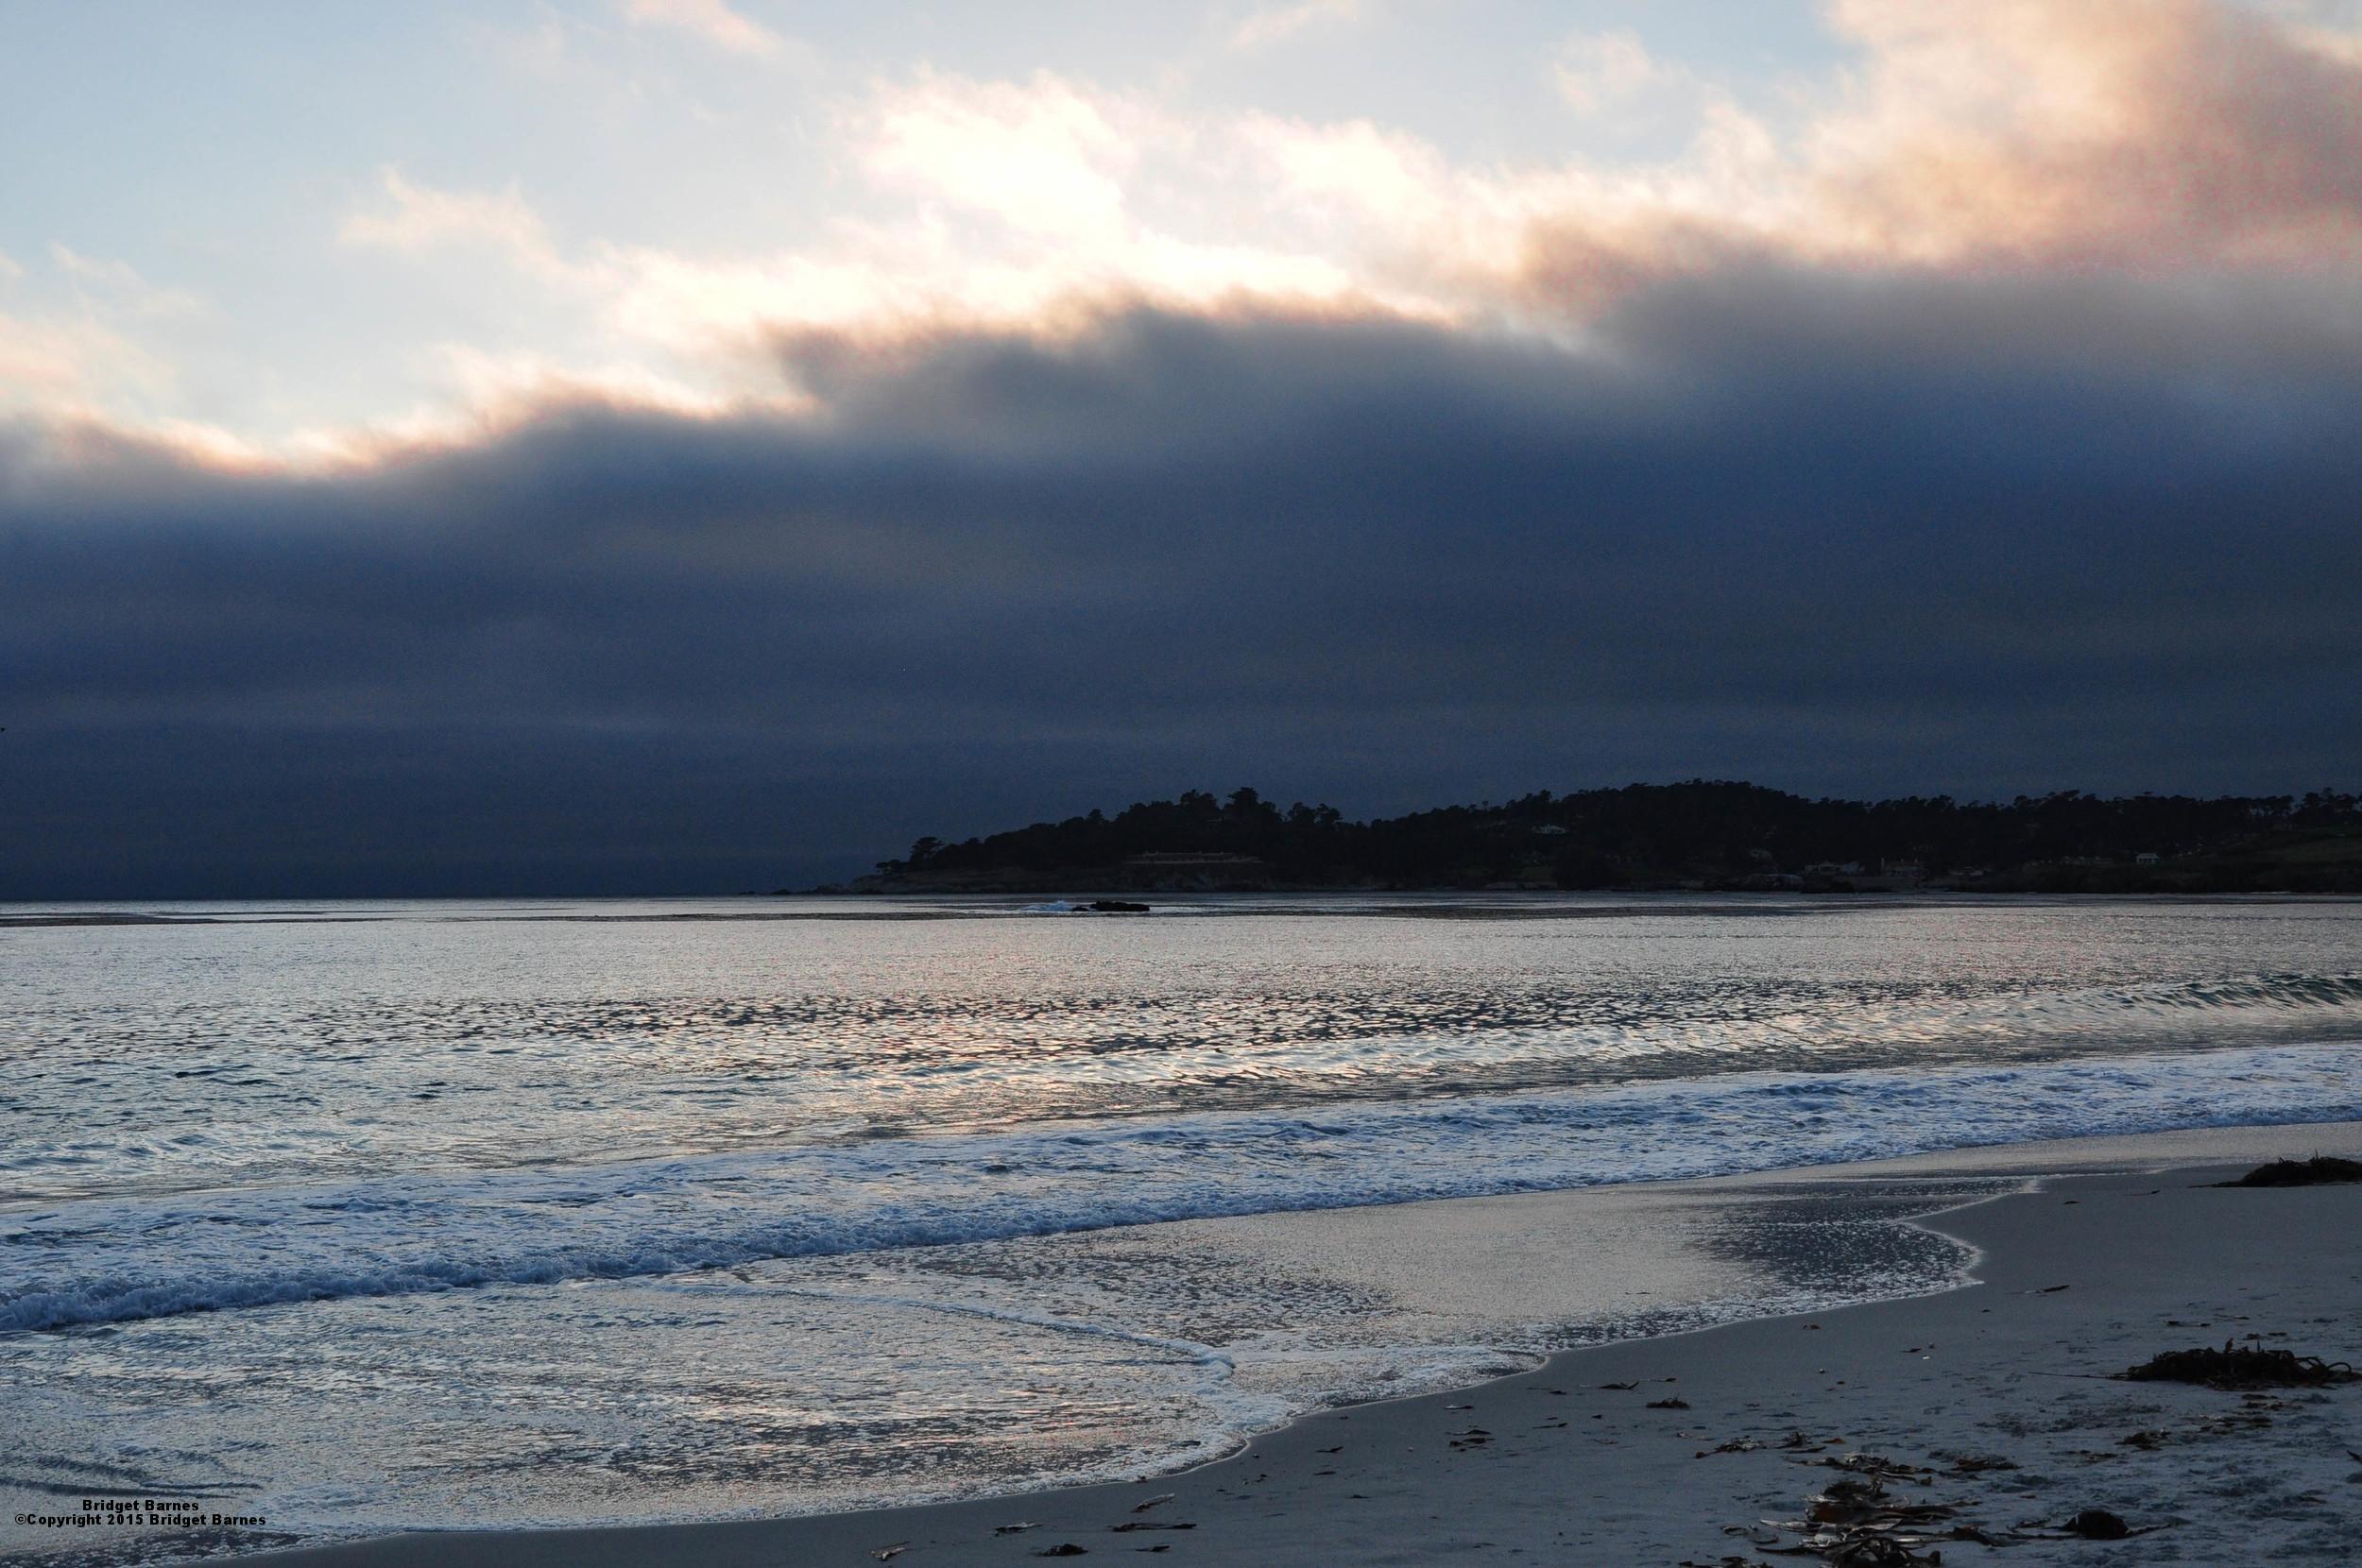 Monterey, California at Dusk  ©Copyright 2015 Bridget Barnes